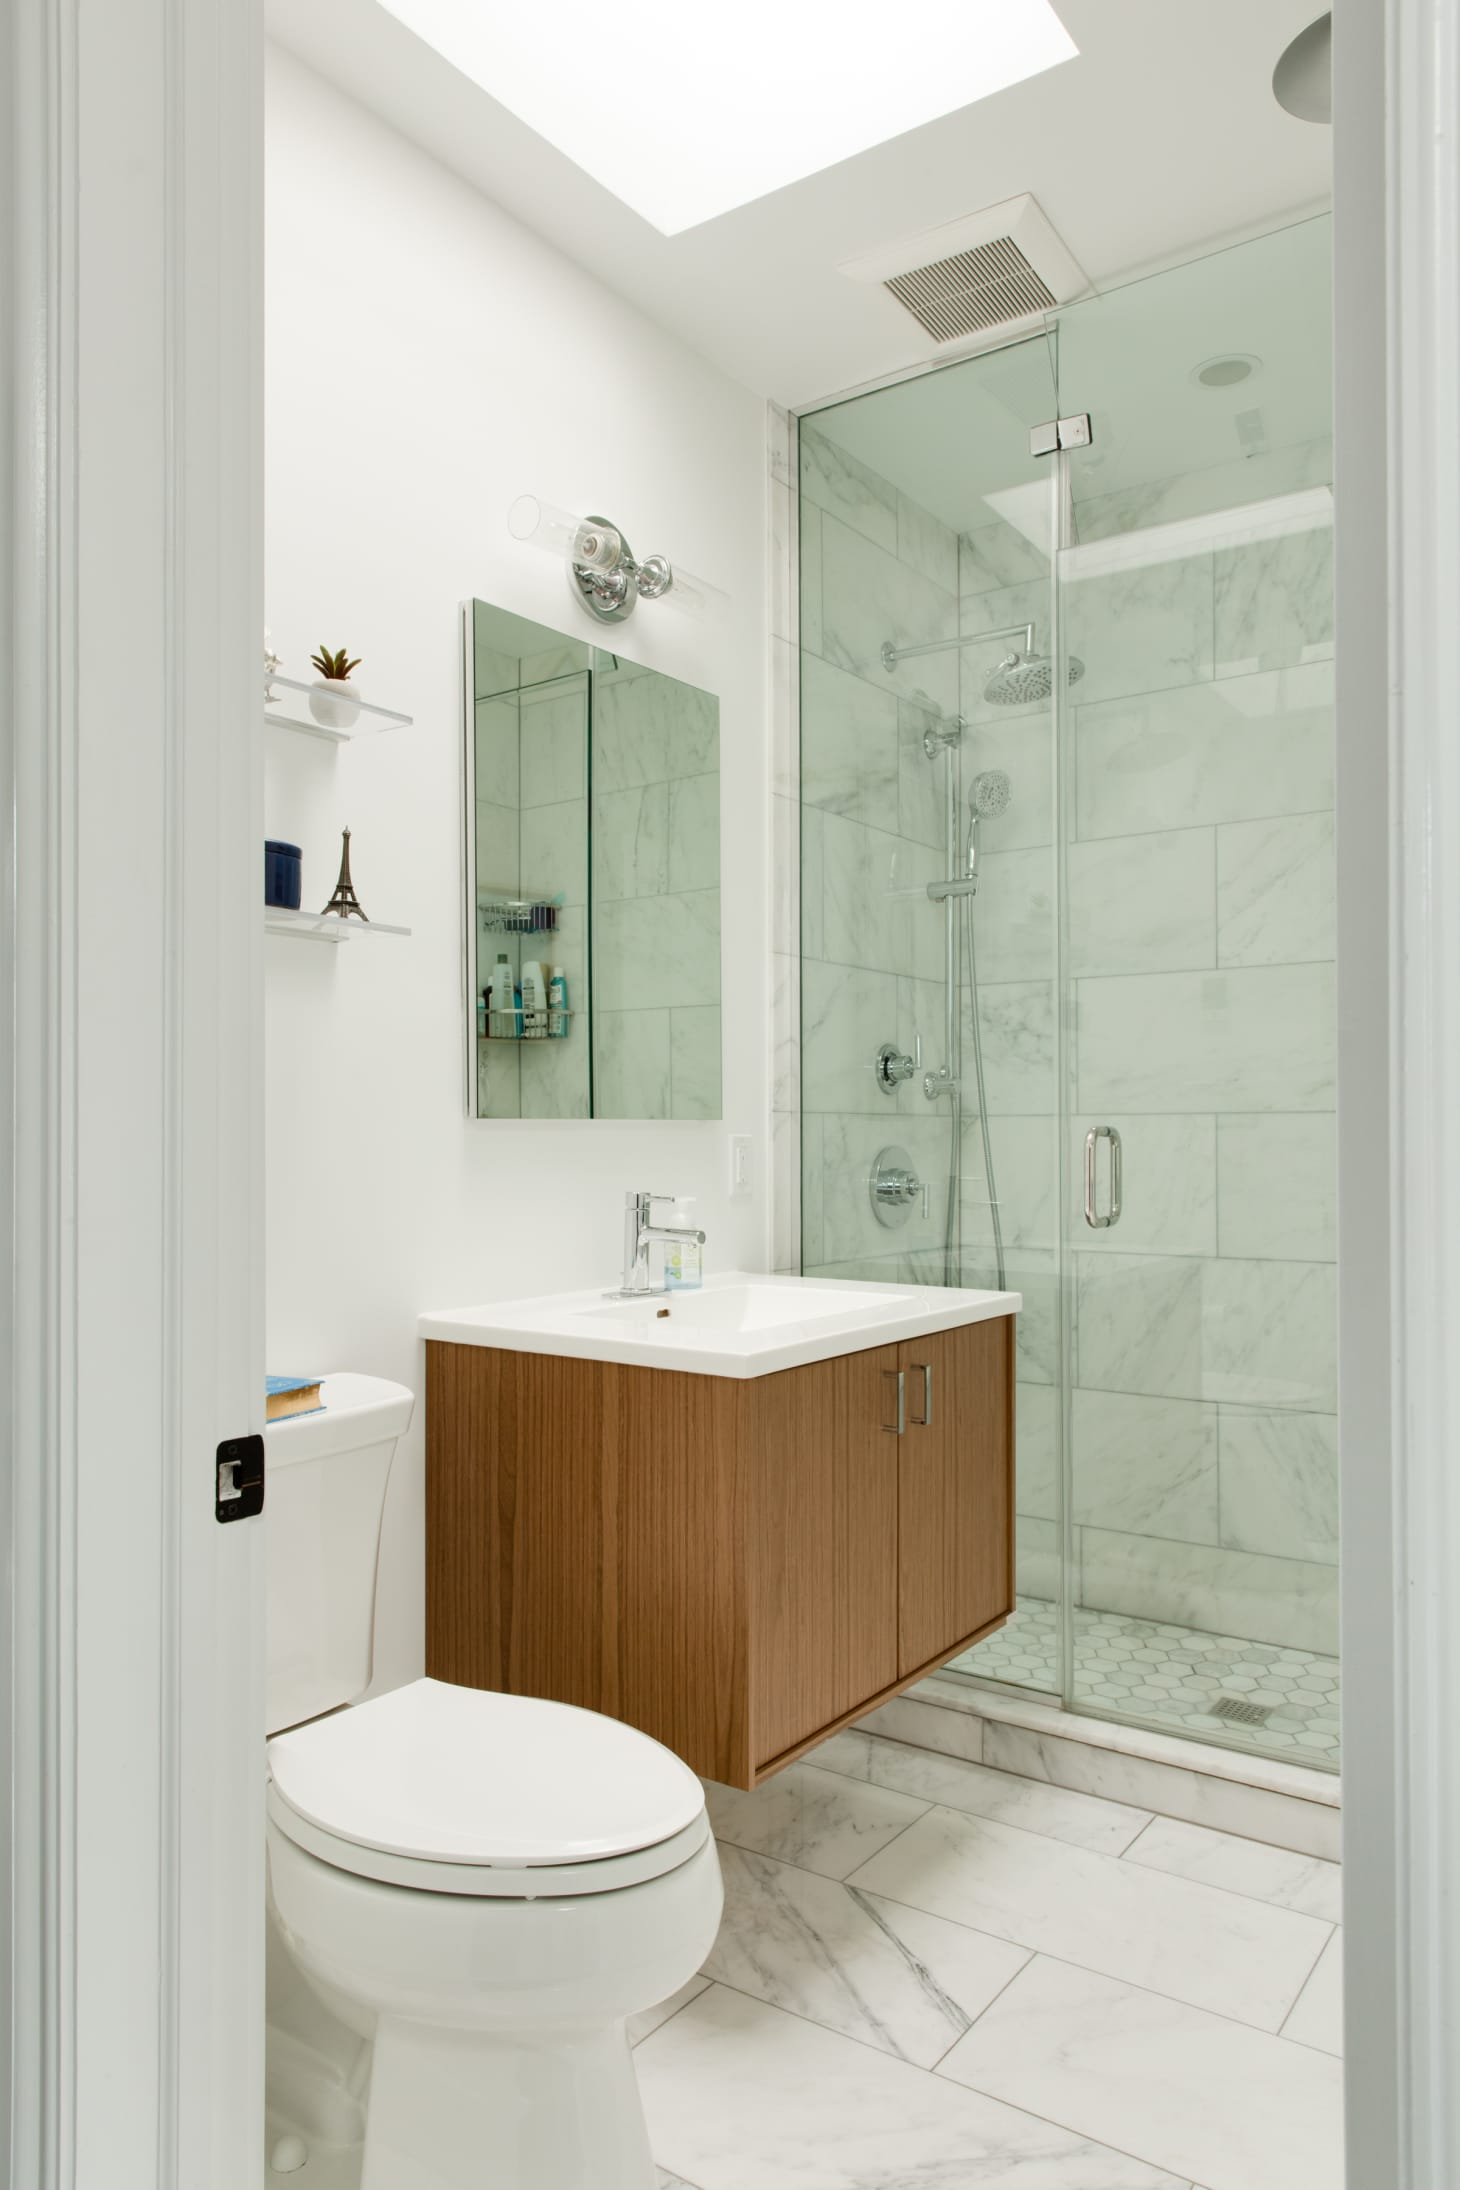 bathroom caulk - how often should you replace? | apartment